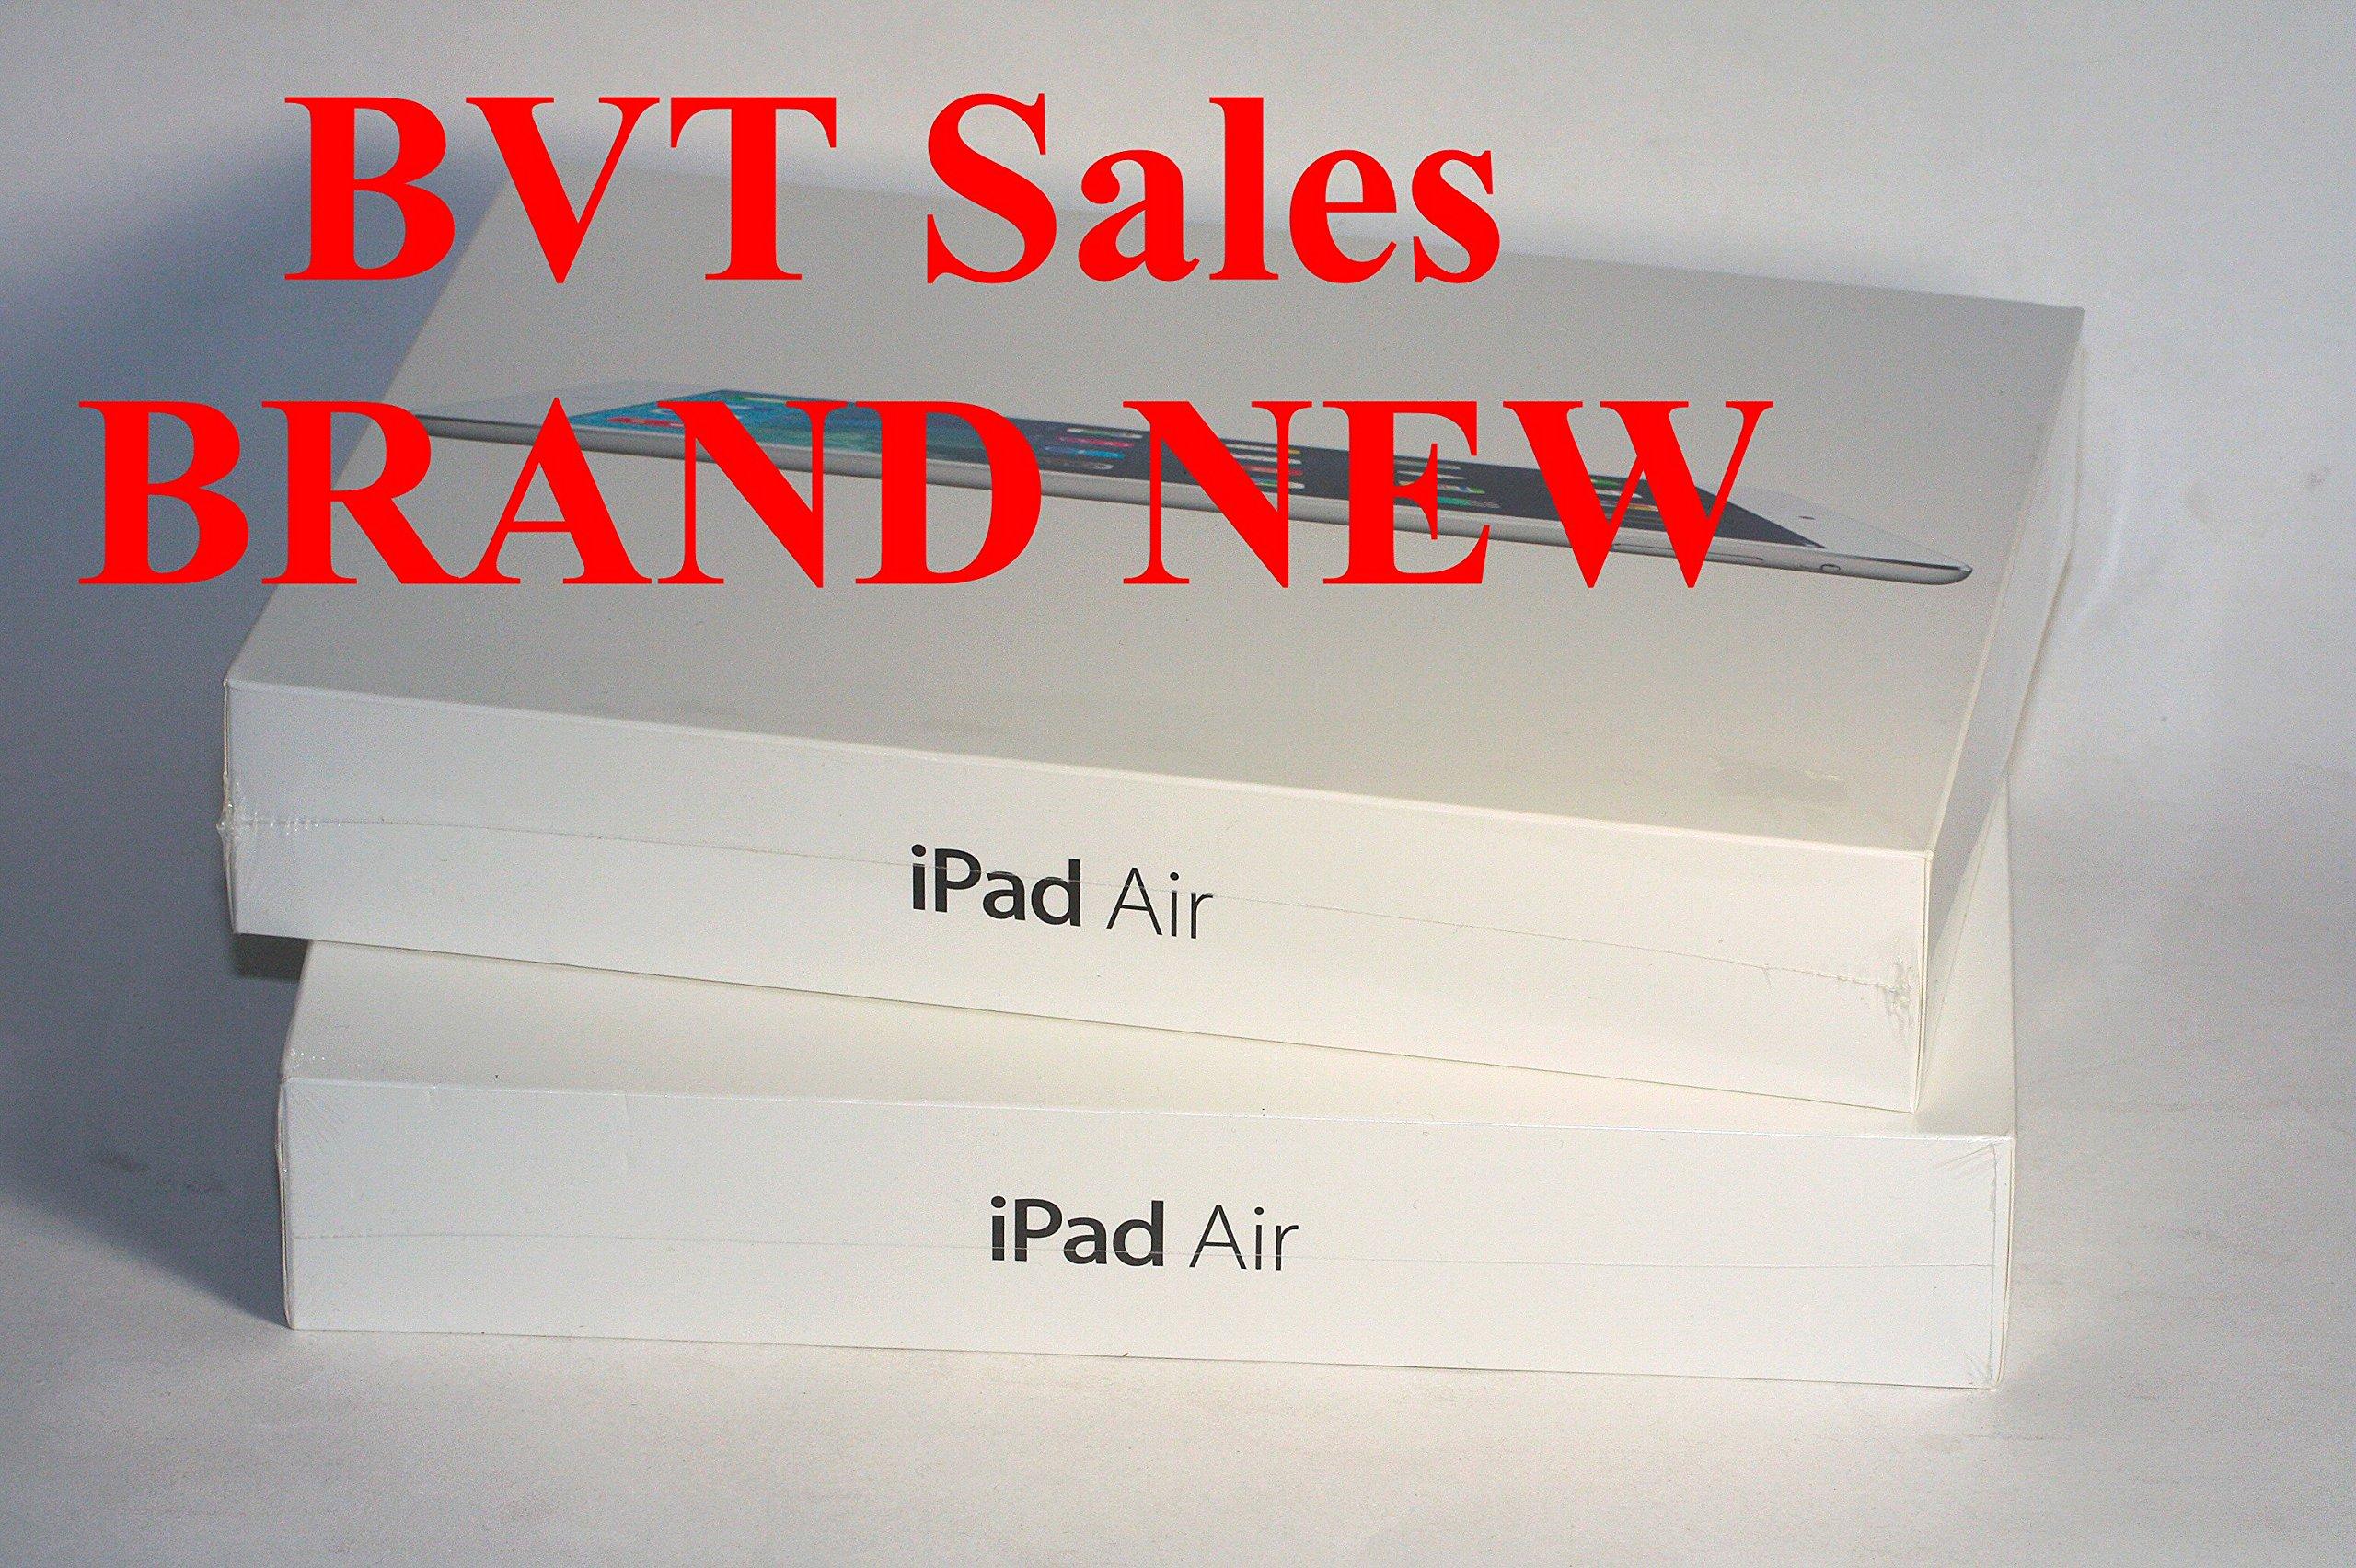 Apple iPad AIR MF012LL/A (64GB, Wi-Fi + 4G LTE, White with Silver)